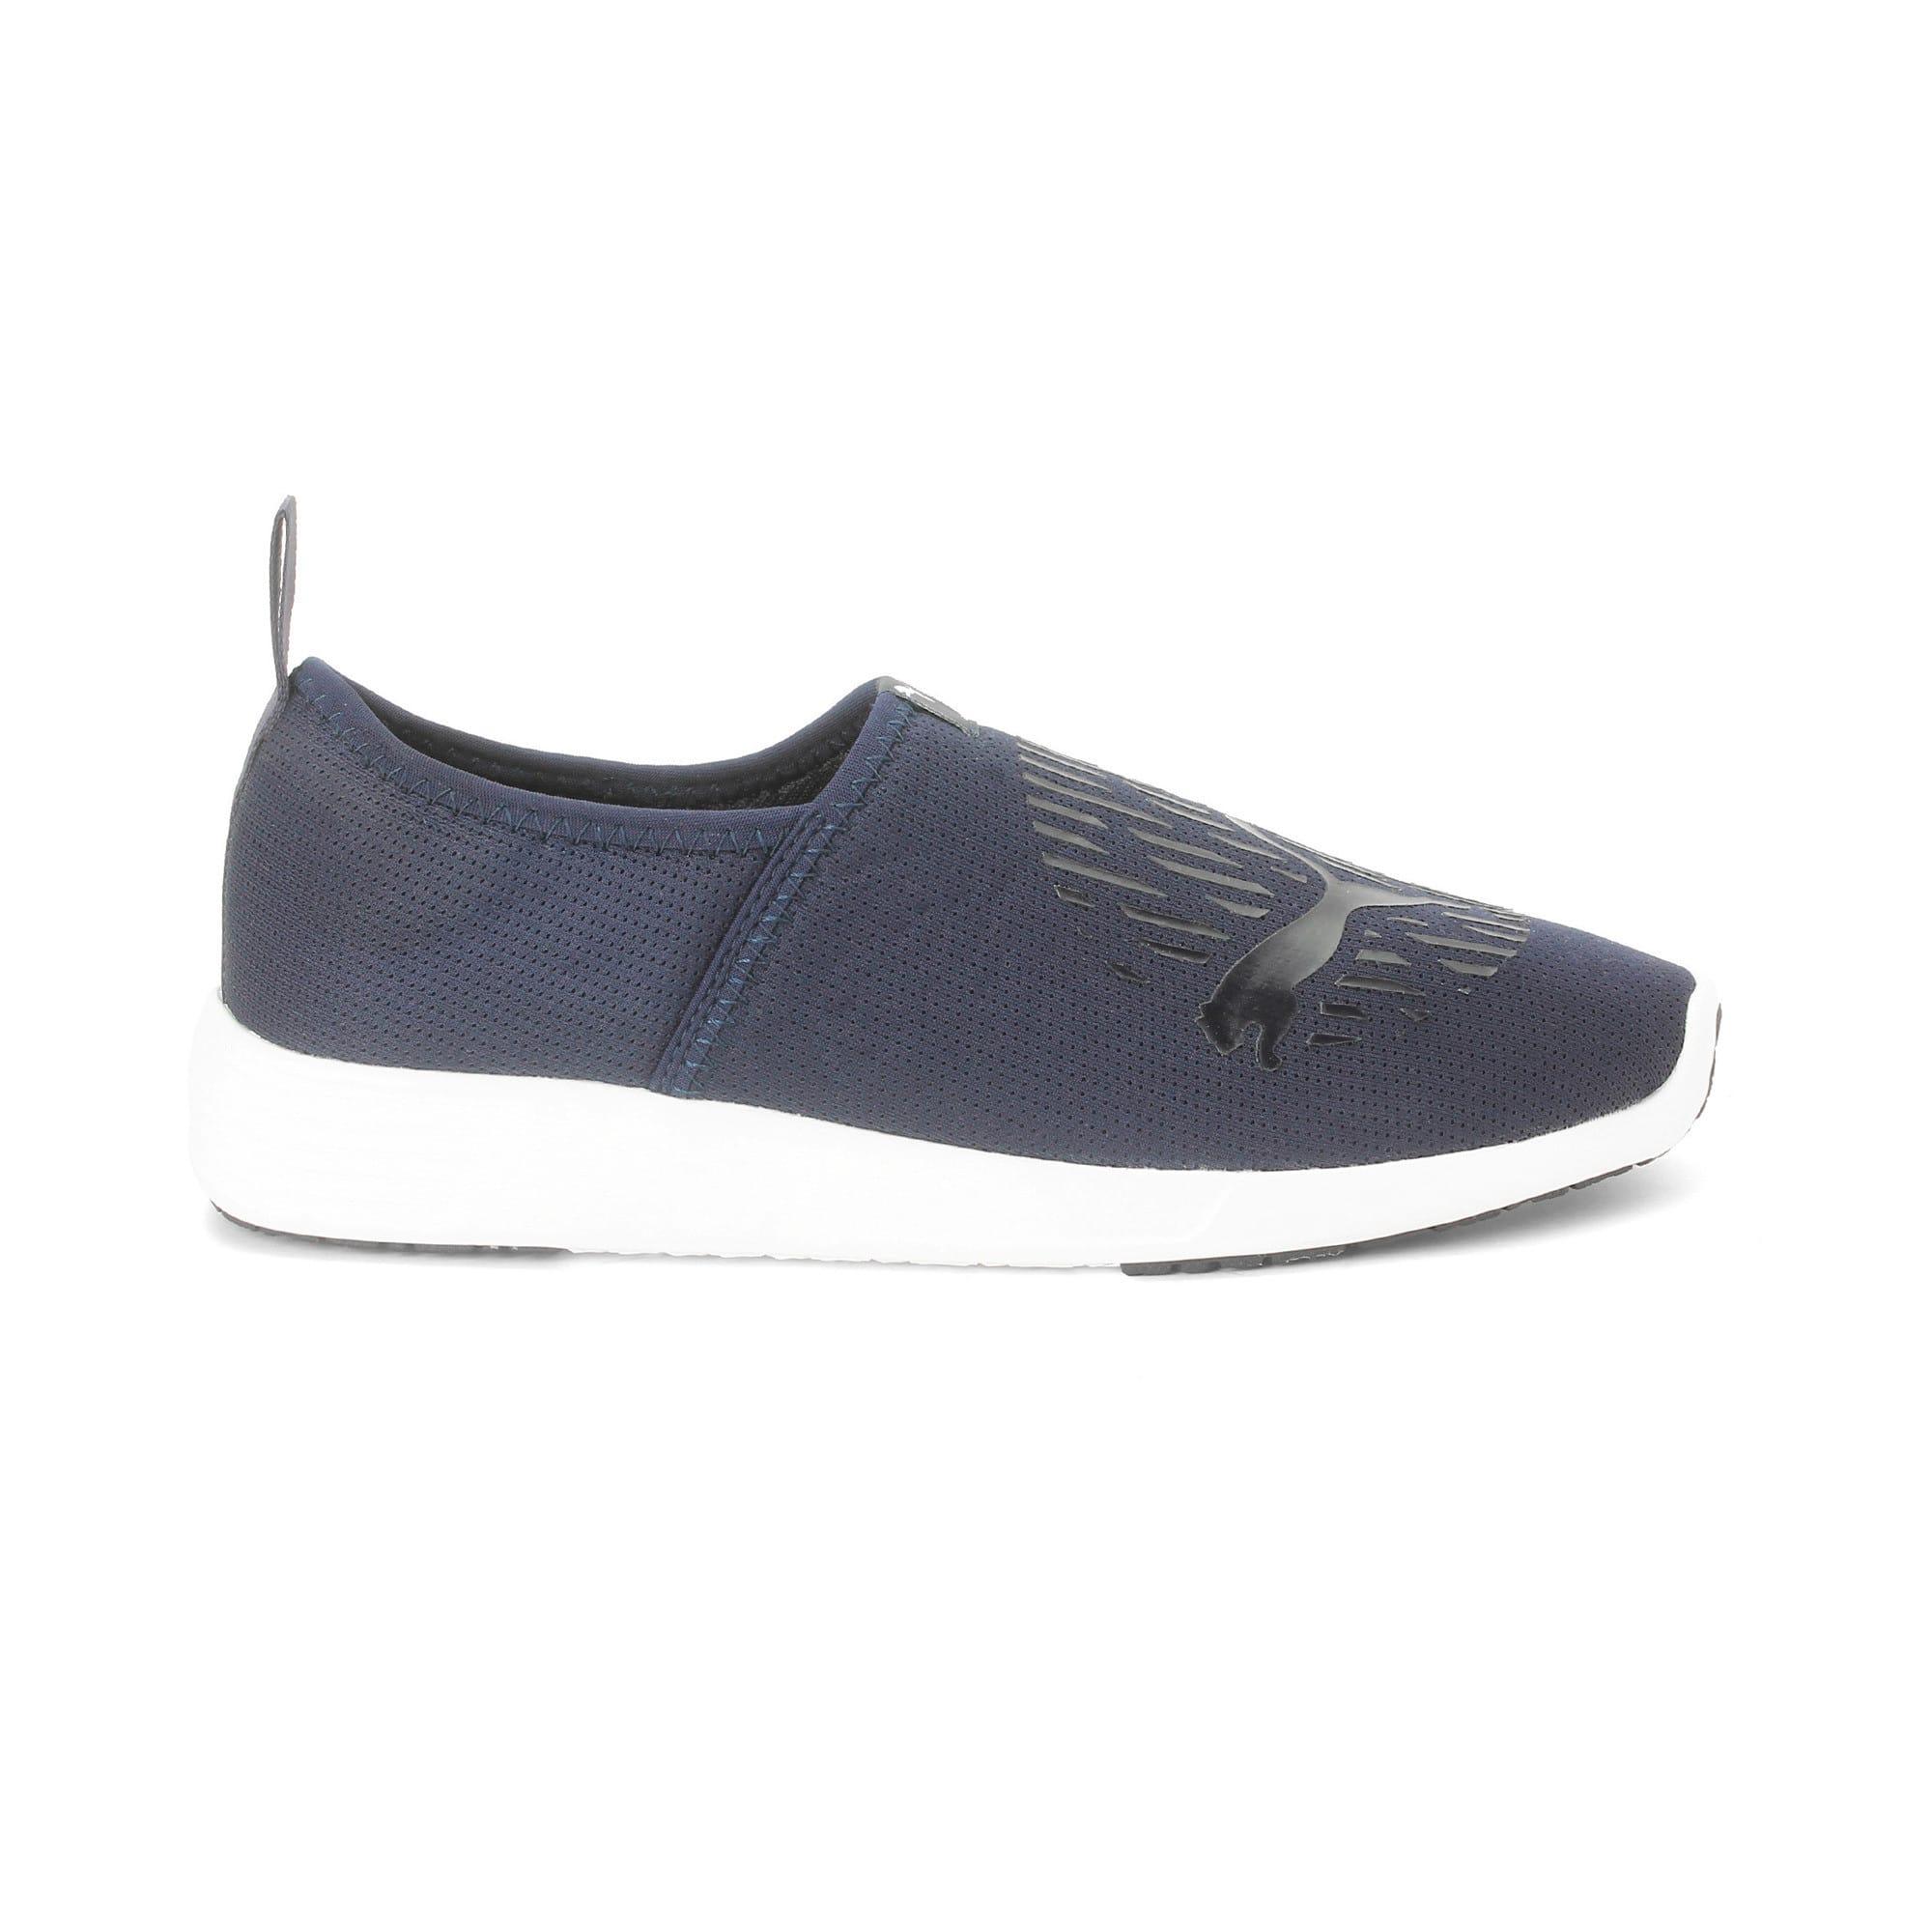 Thumbnail 5 of ST Comfort IDP Men's Sportstyle Shoes, Peacoat-Puma White, medium-IND